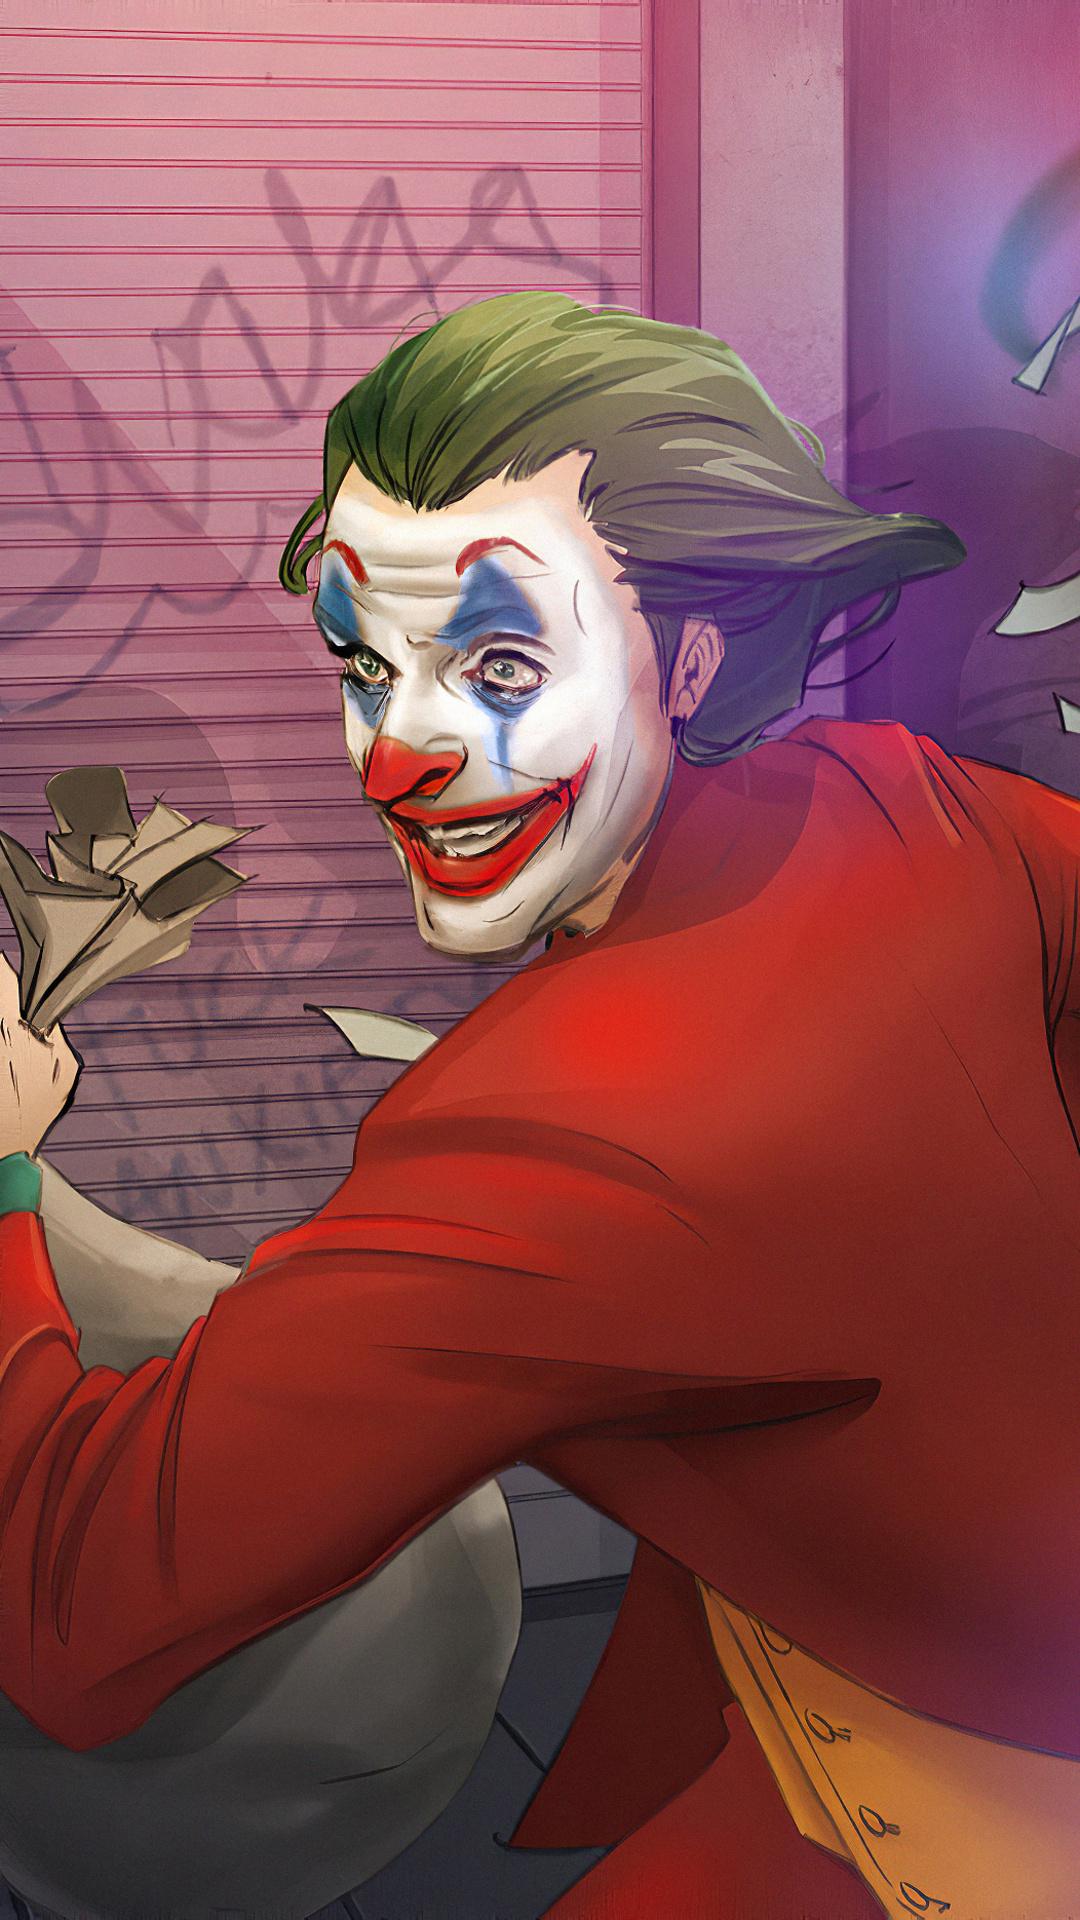 joker-and-harley-quinn-runaway-jk.jpg